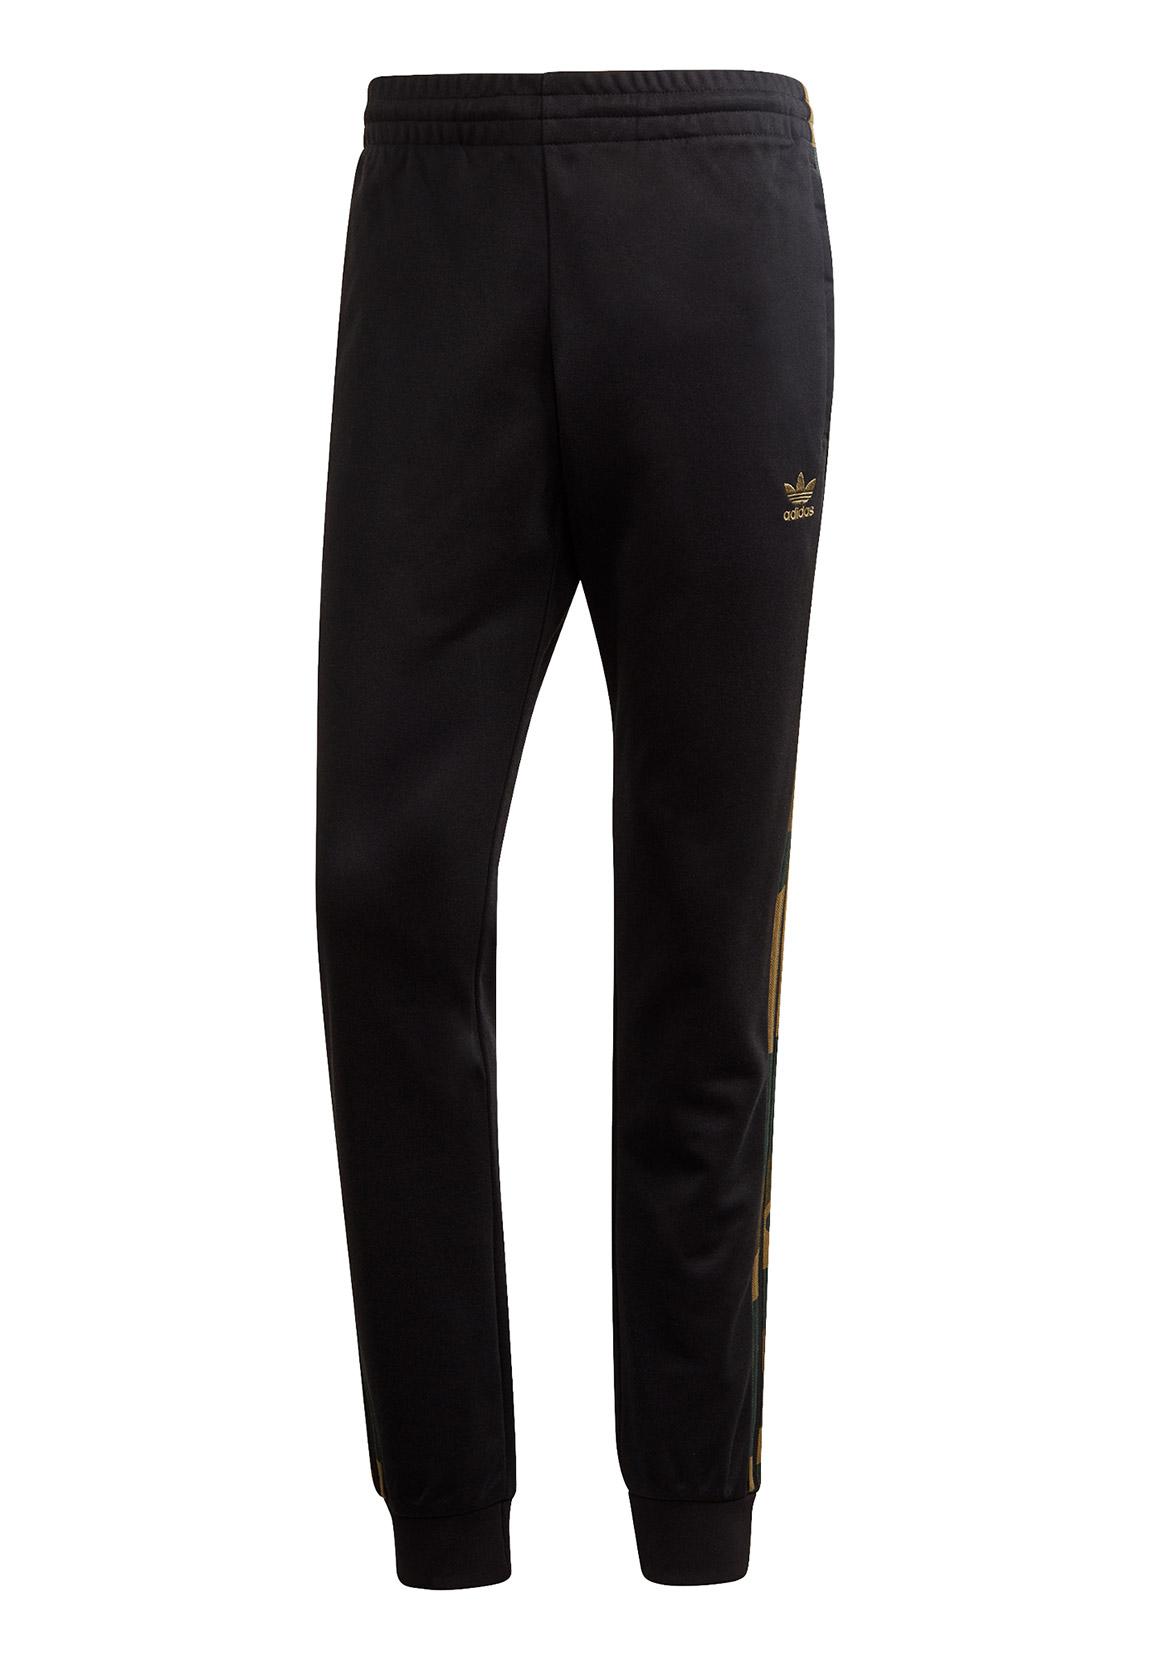 adidas originals jogginghose herren schwarz polyester